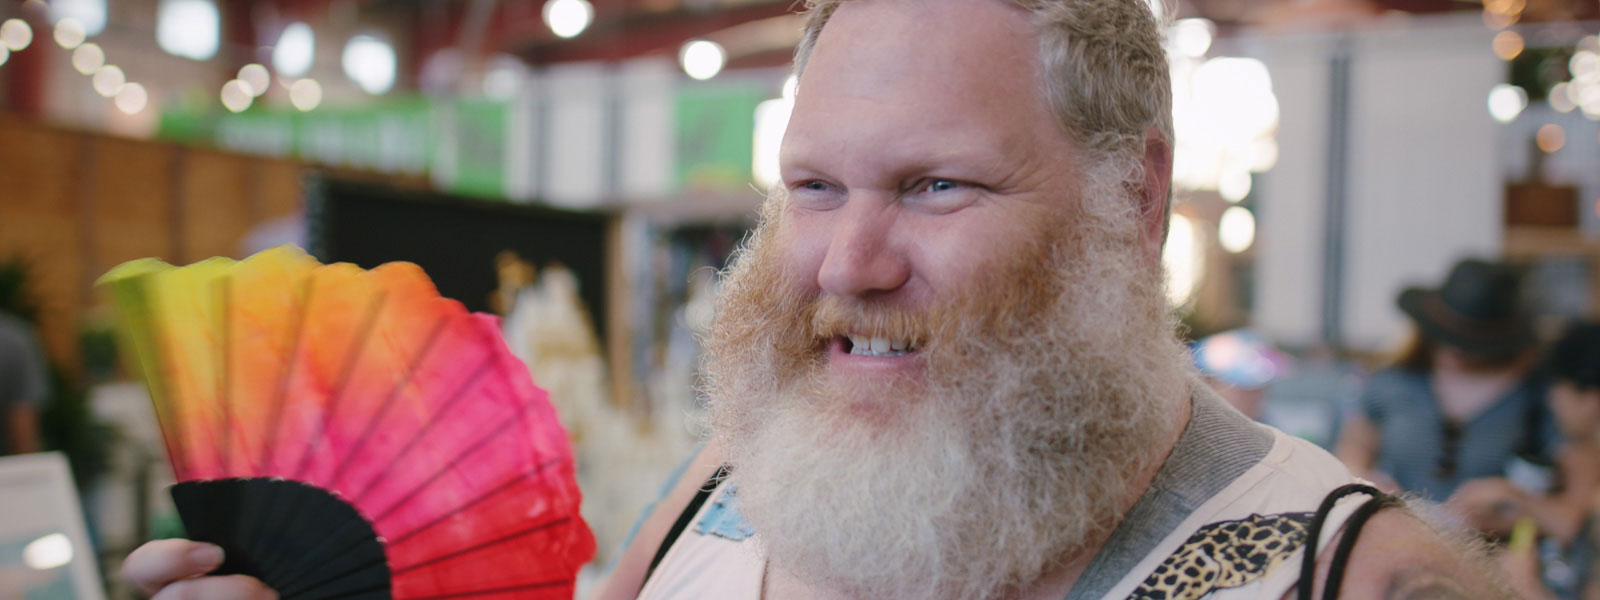 Man with rainbow flag and great big beard